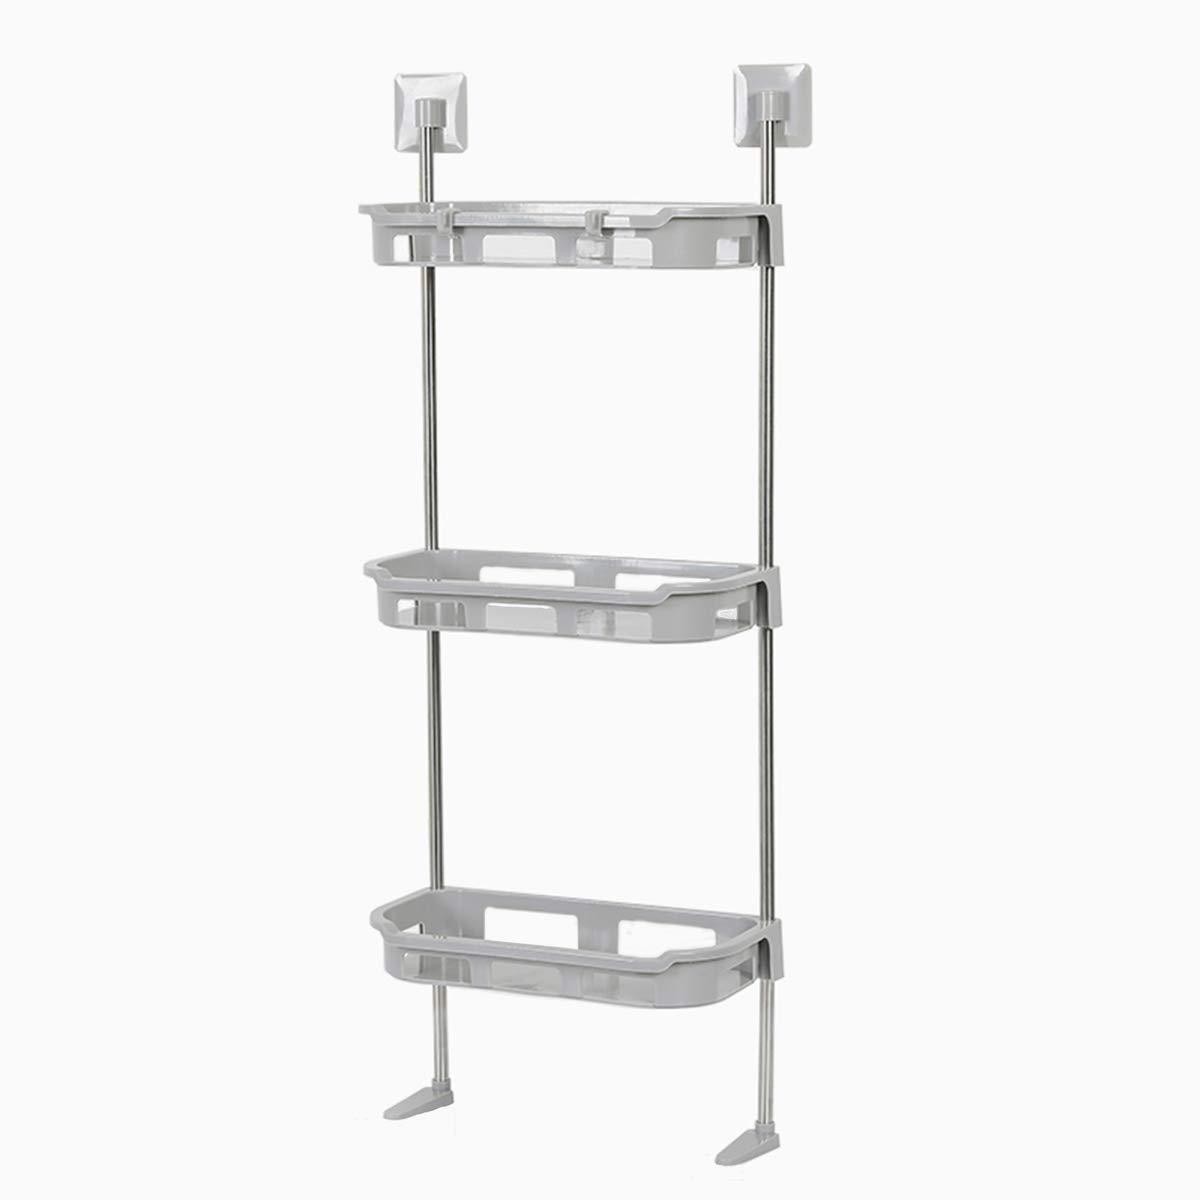 Lovfri Bathroom Storage Shelf, 3-Shelf Bathroom Organizer Over The Toilet, Space Saver for Bathroom, Kitchen, Laundry Room, No Drilling, Easy to Assemble(11.8x34.6 inch) by Lovfri